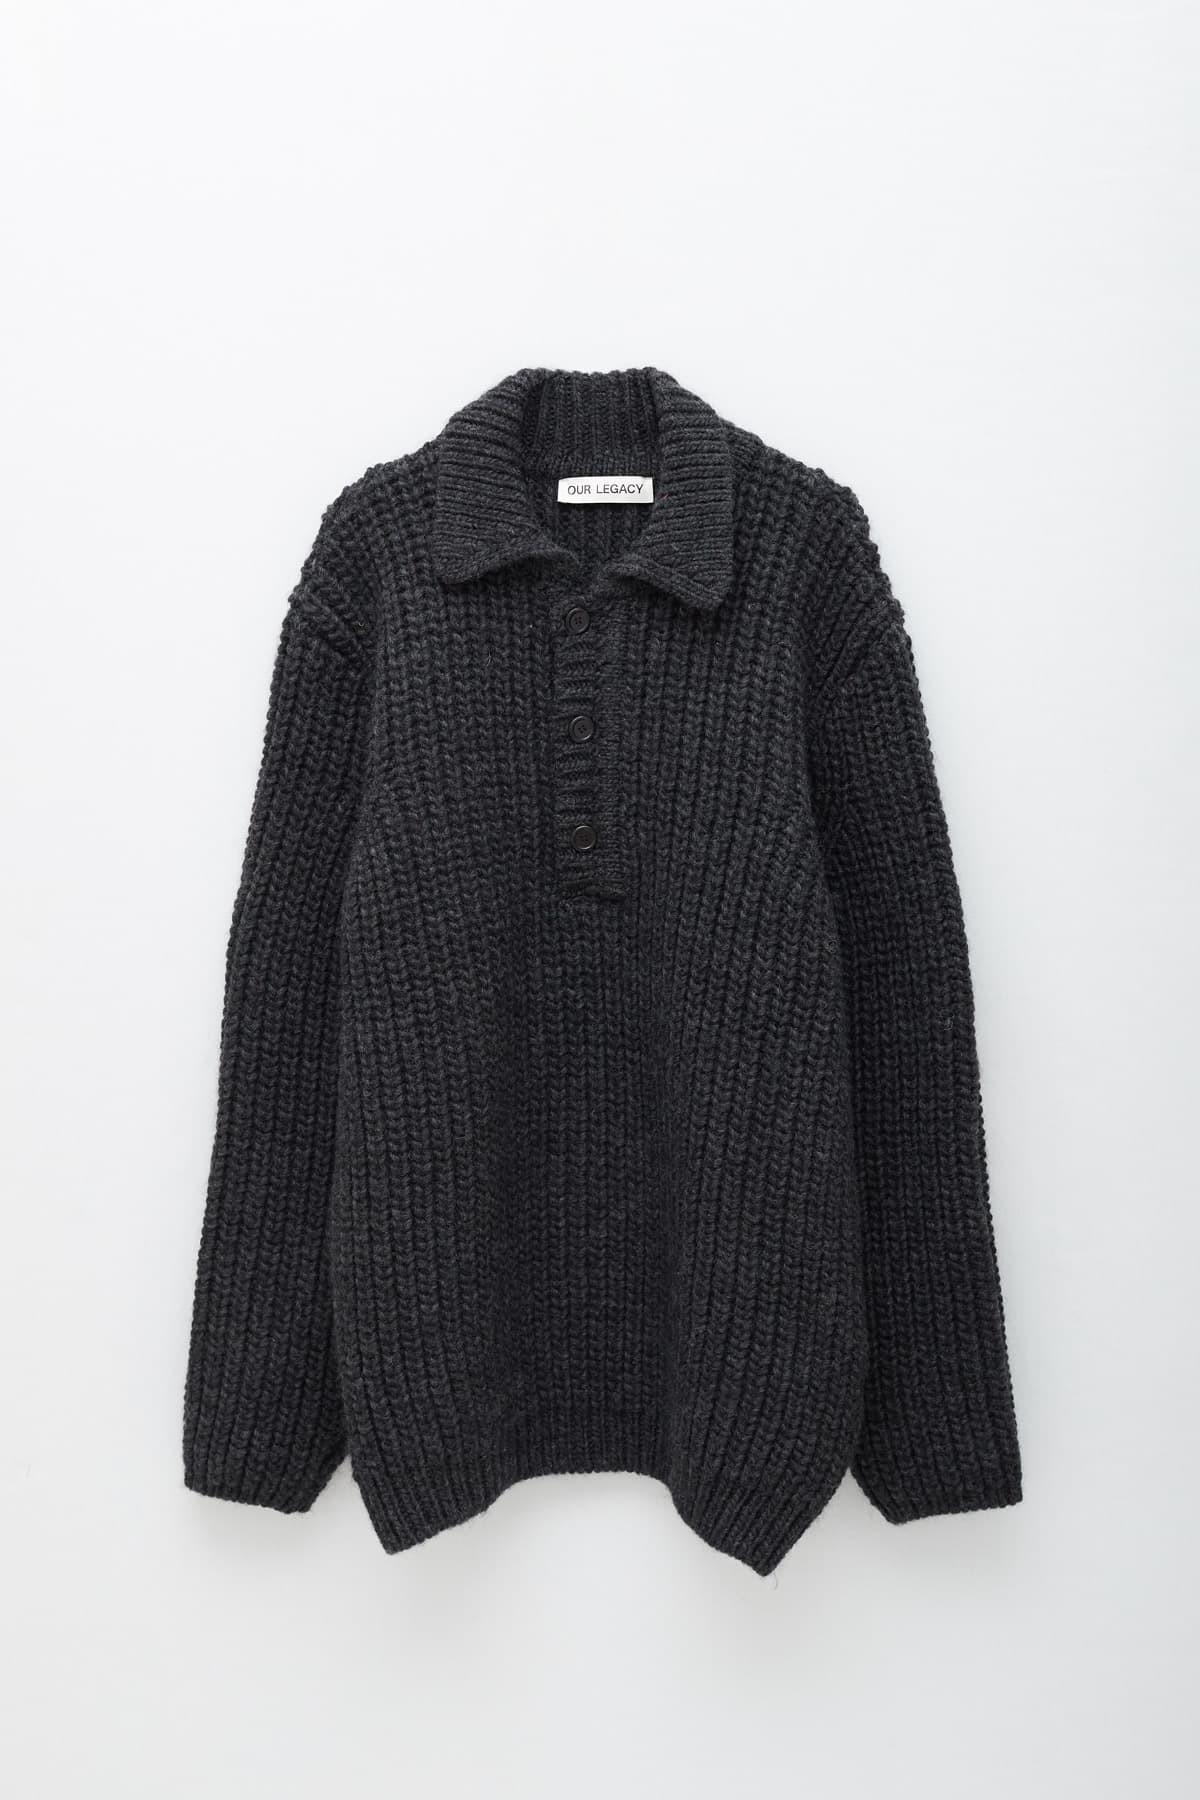 Comprar Telfar Yellow Medium Shopper Bag